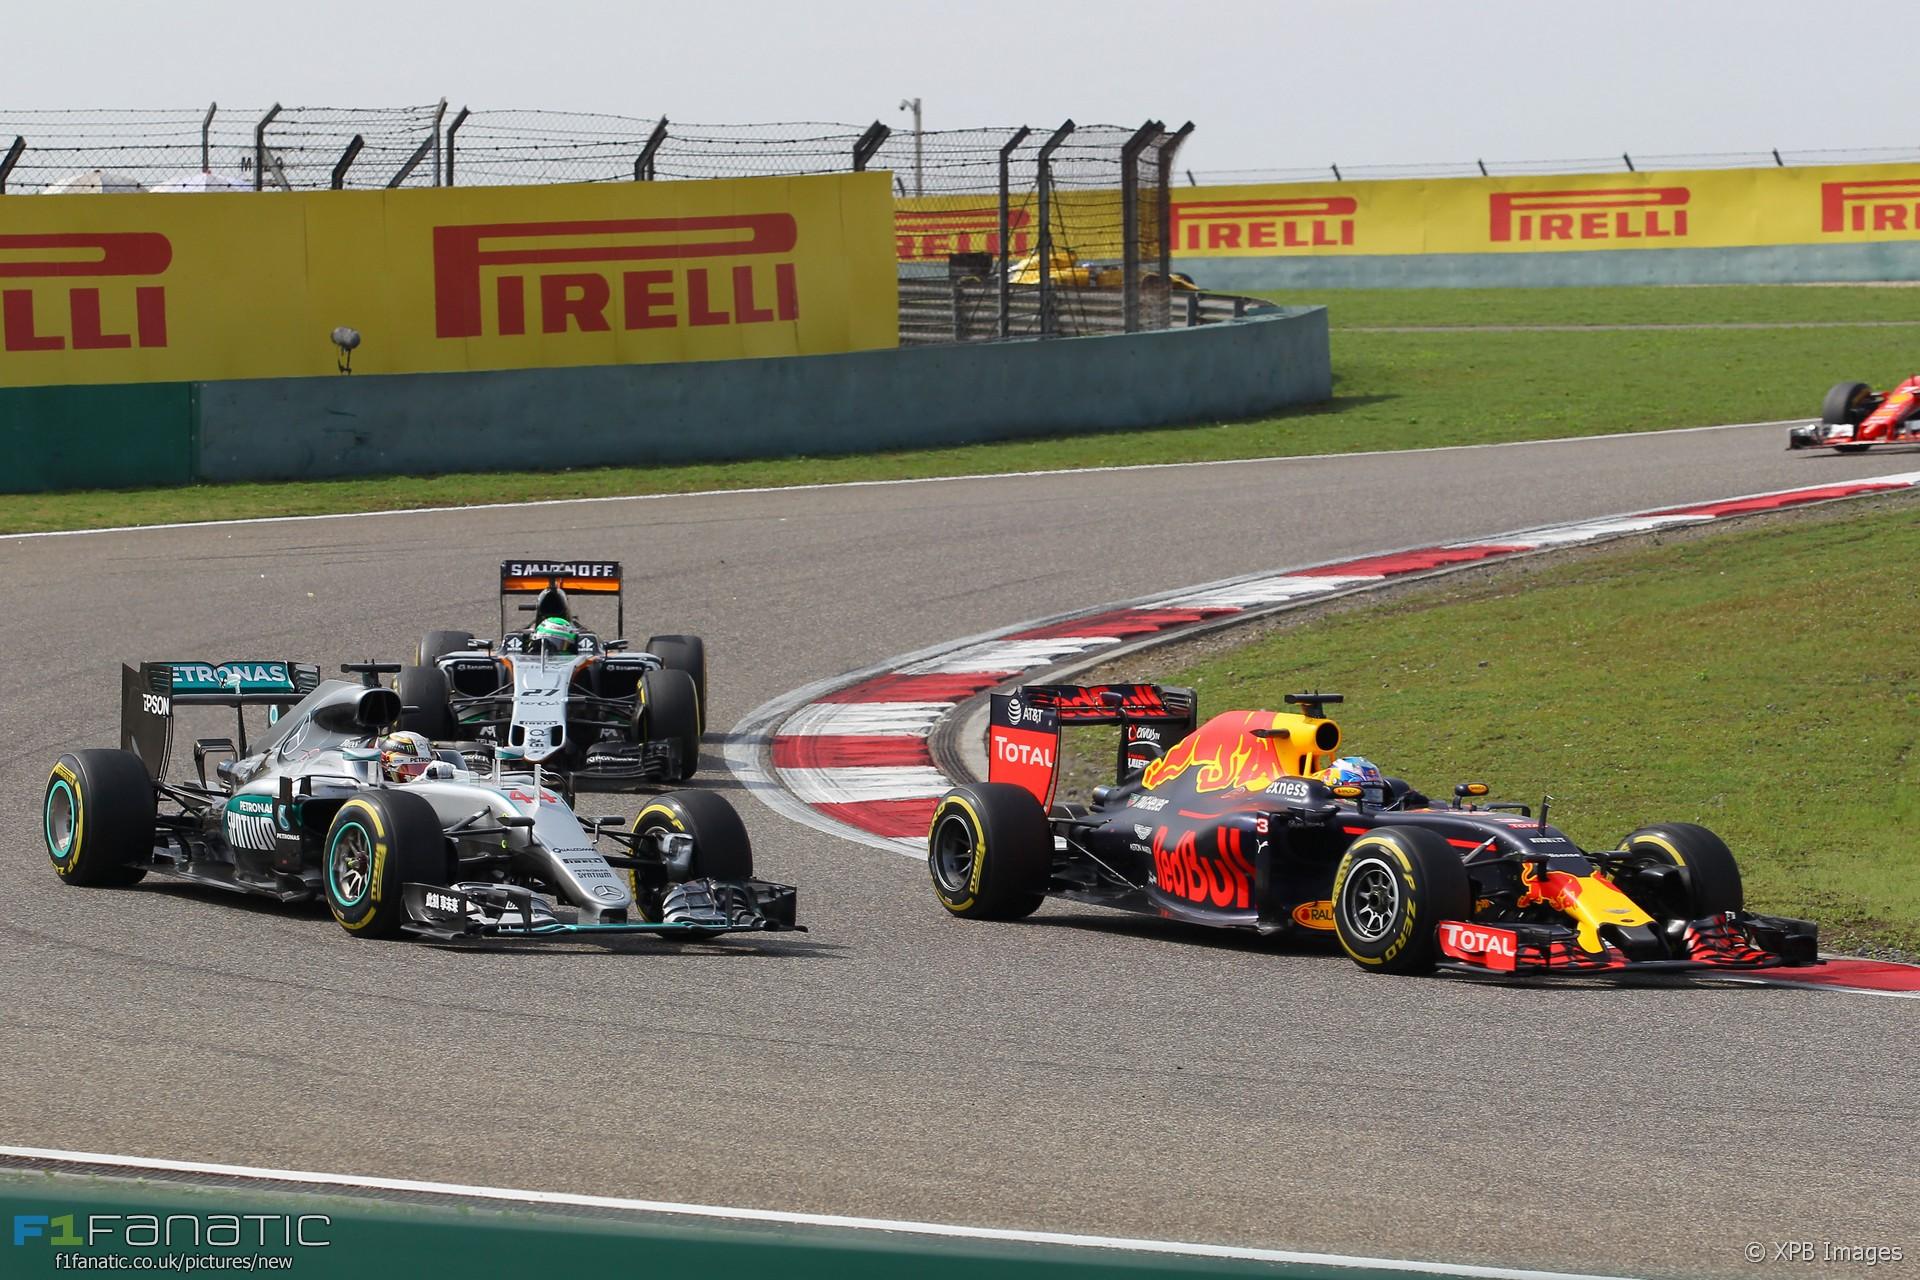 Lewis Hamilton, Daniel Ricciardo, Shanghai International Circuit, 2016